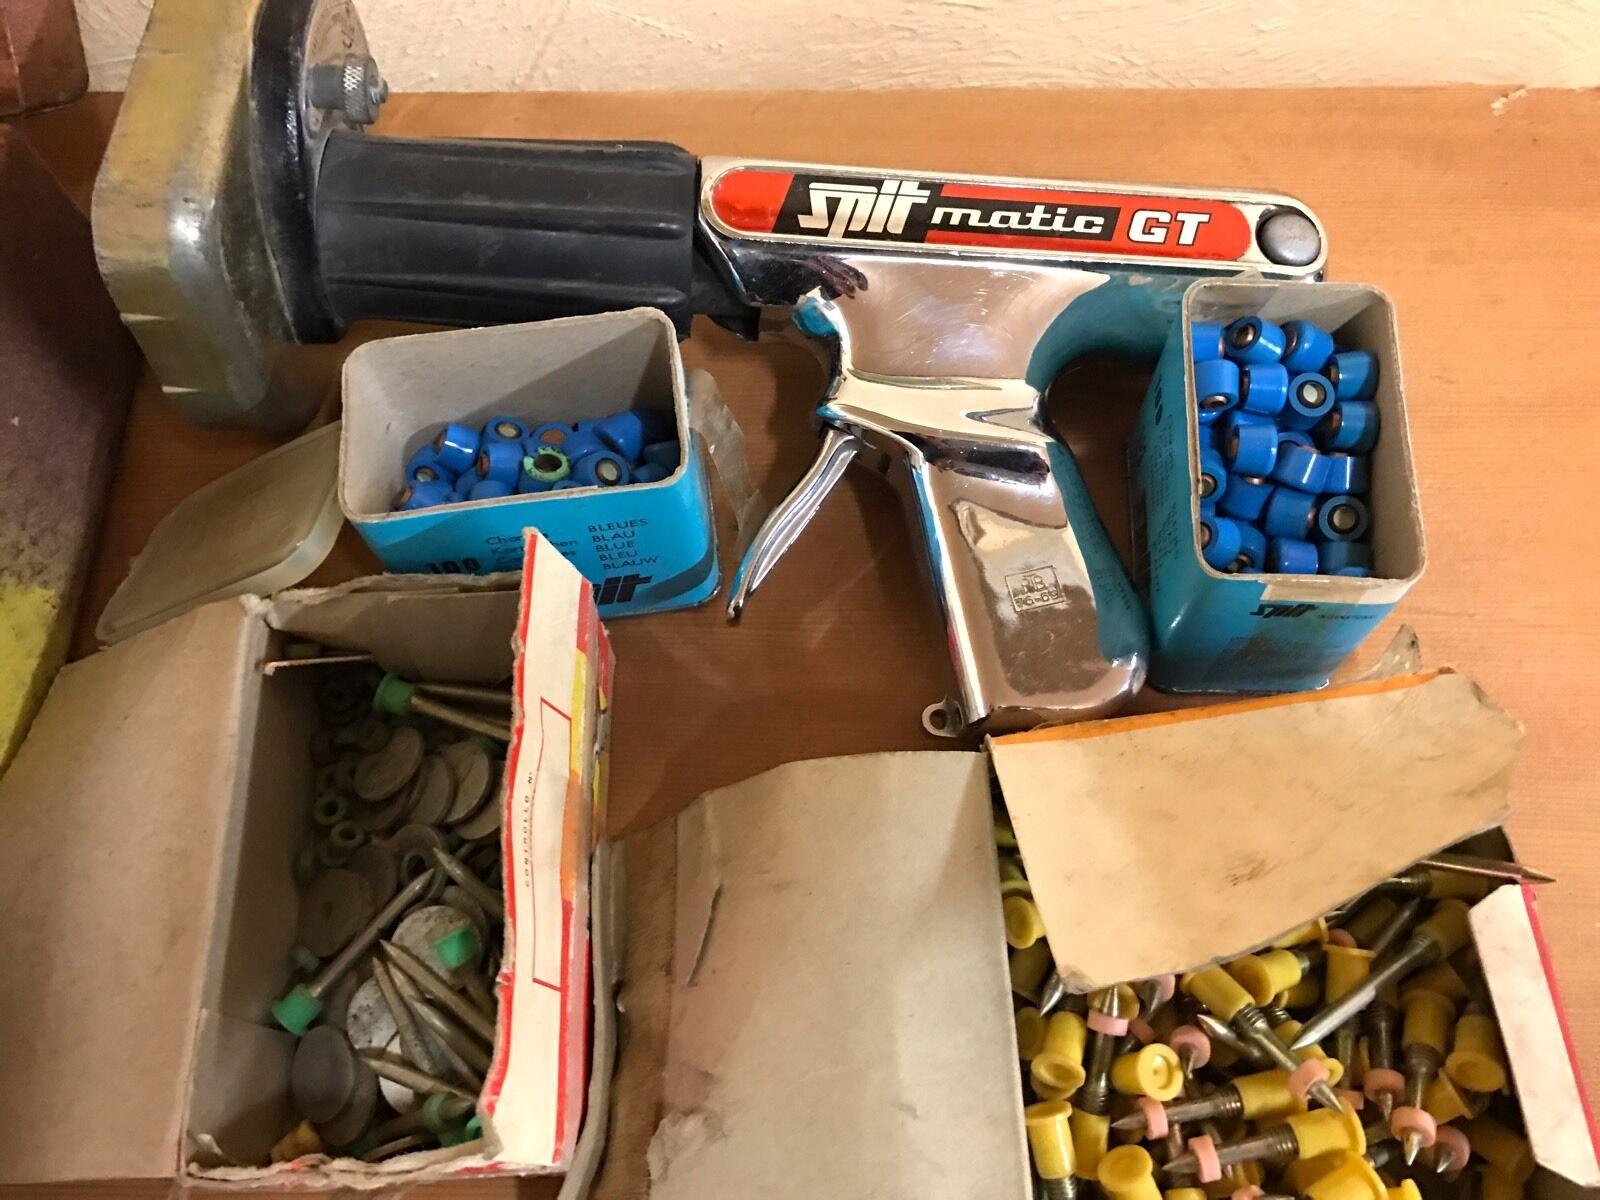 SPIT MATIC GT Bolzenschussgerät mit Munition Nagel und Koffer